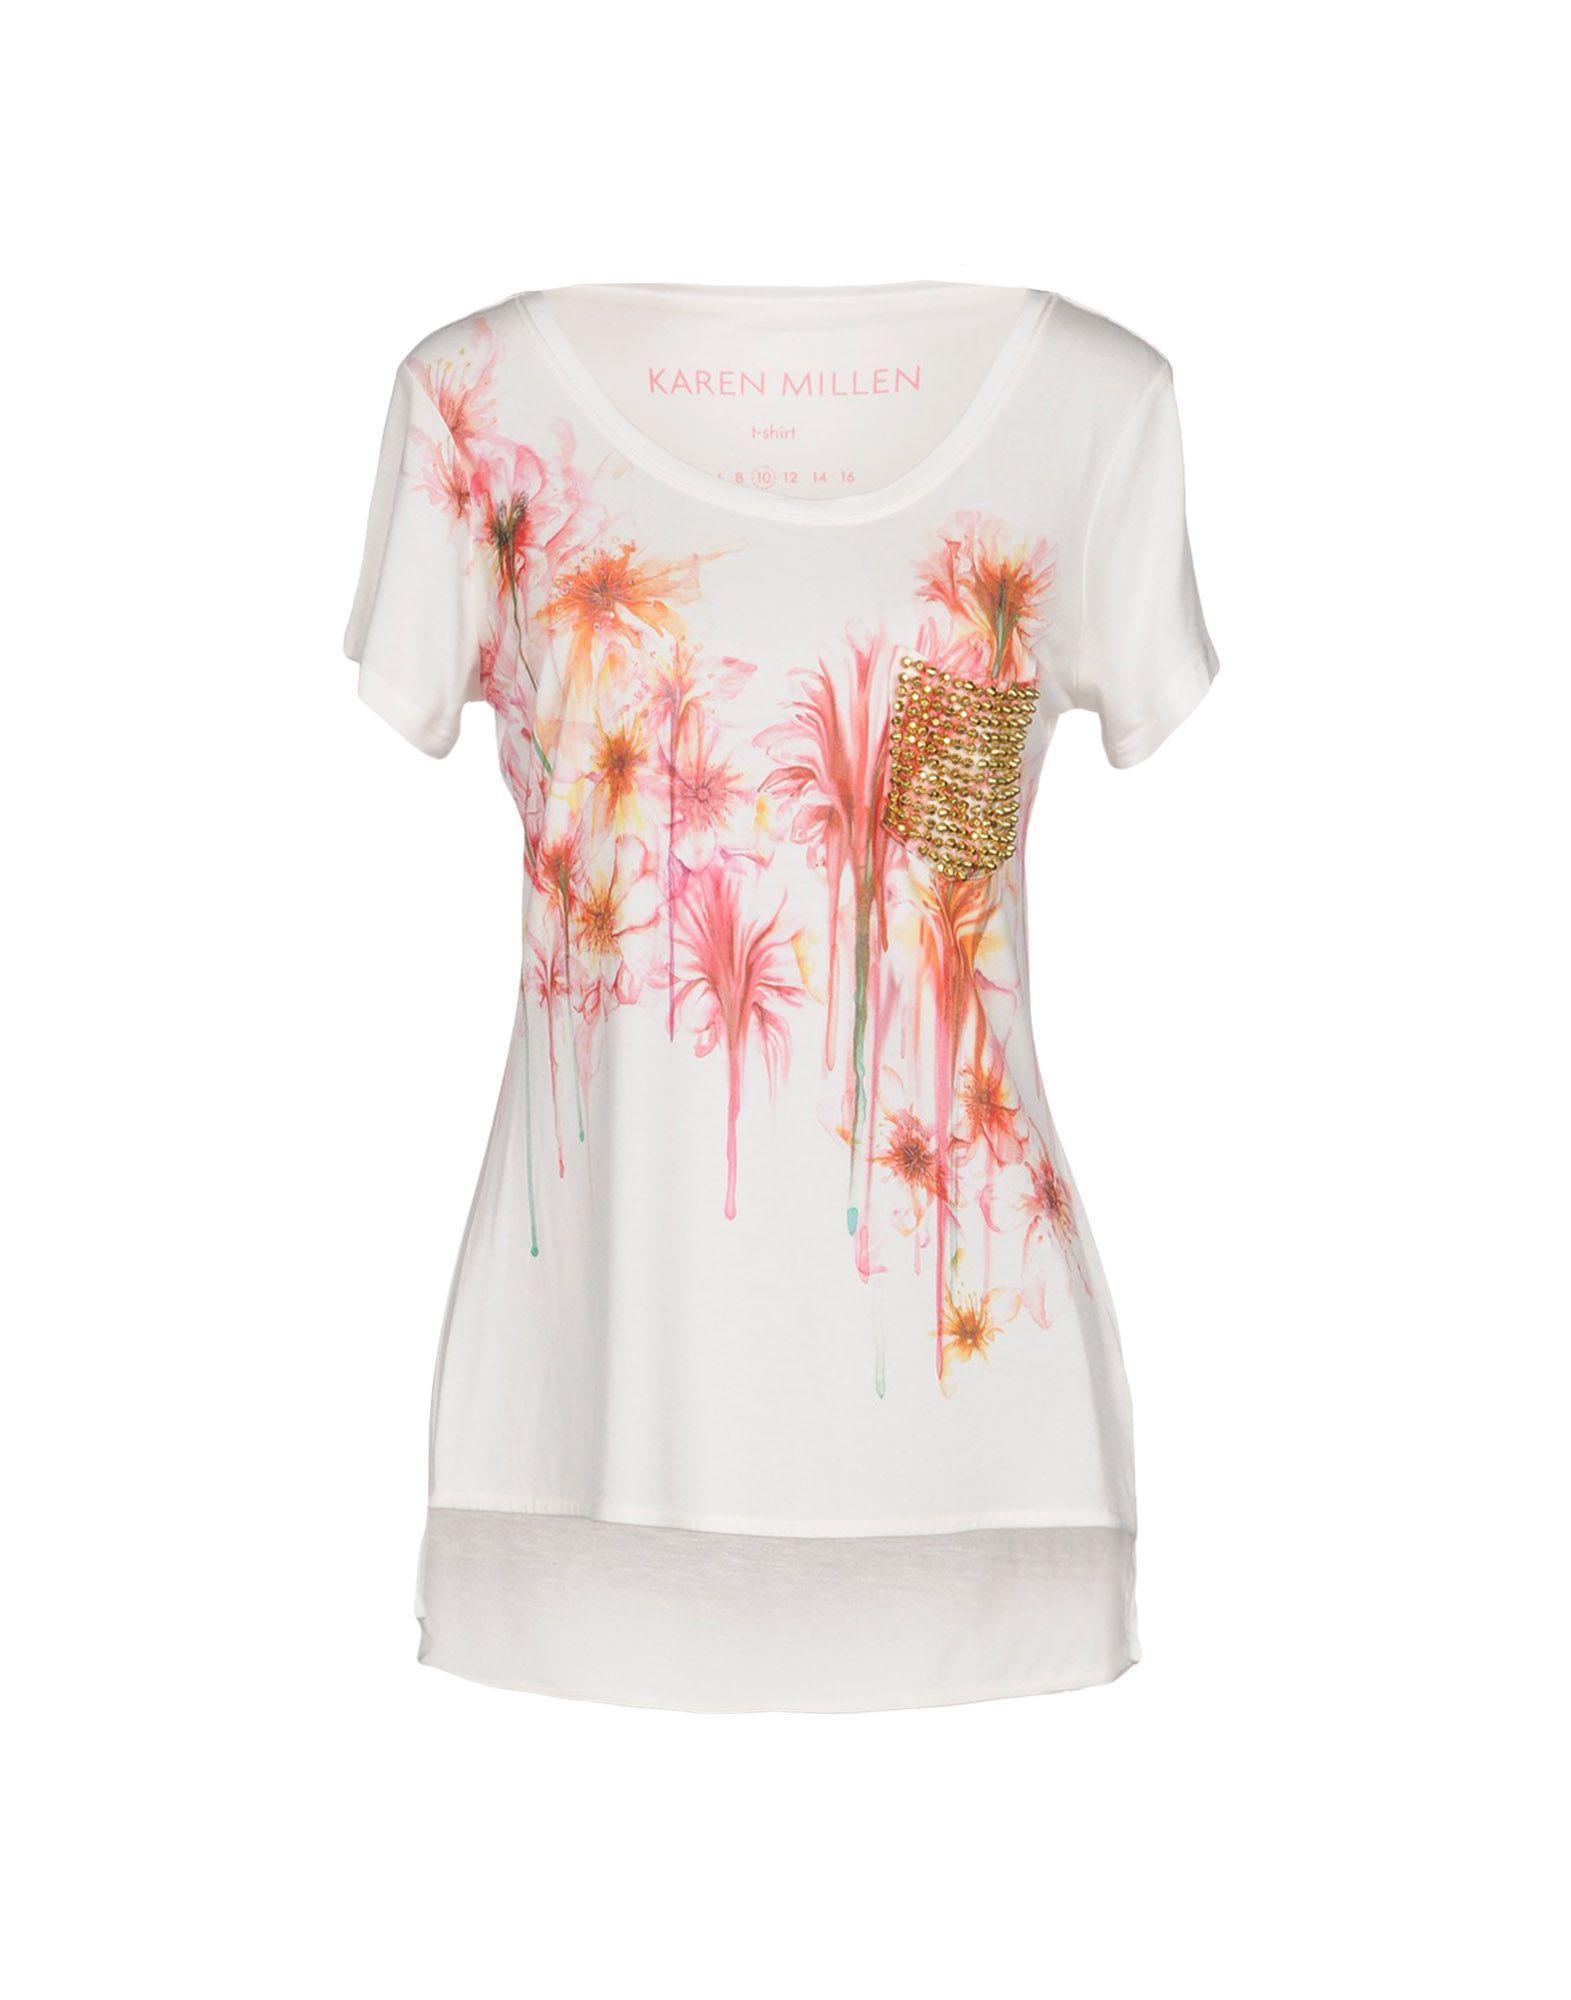 Karen Millen T-shirts In Ivory